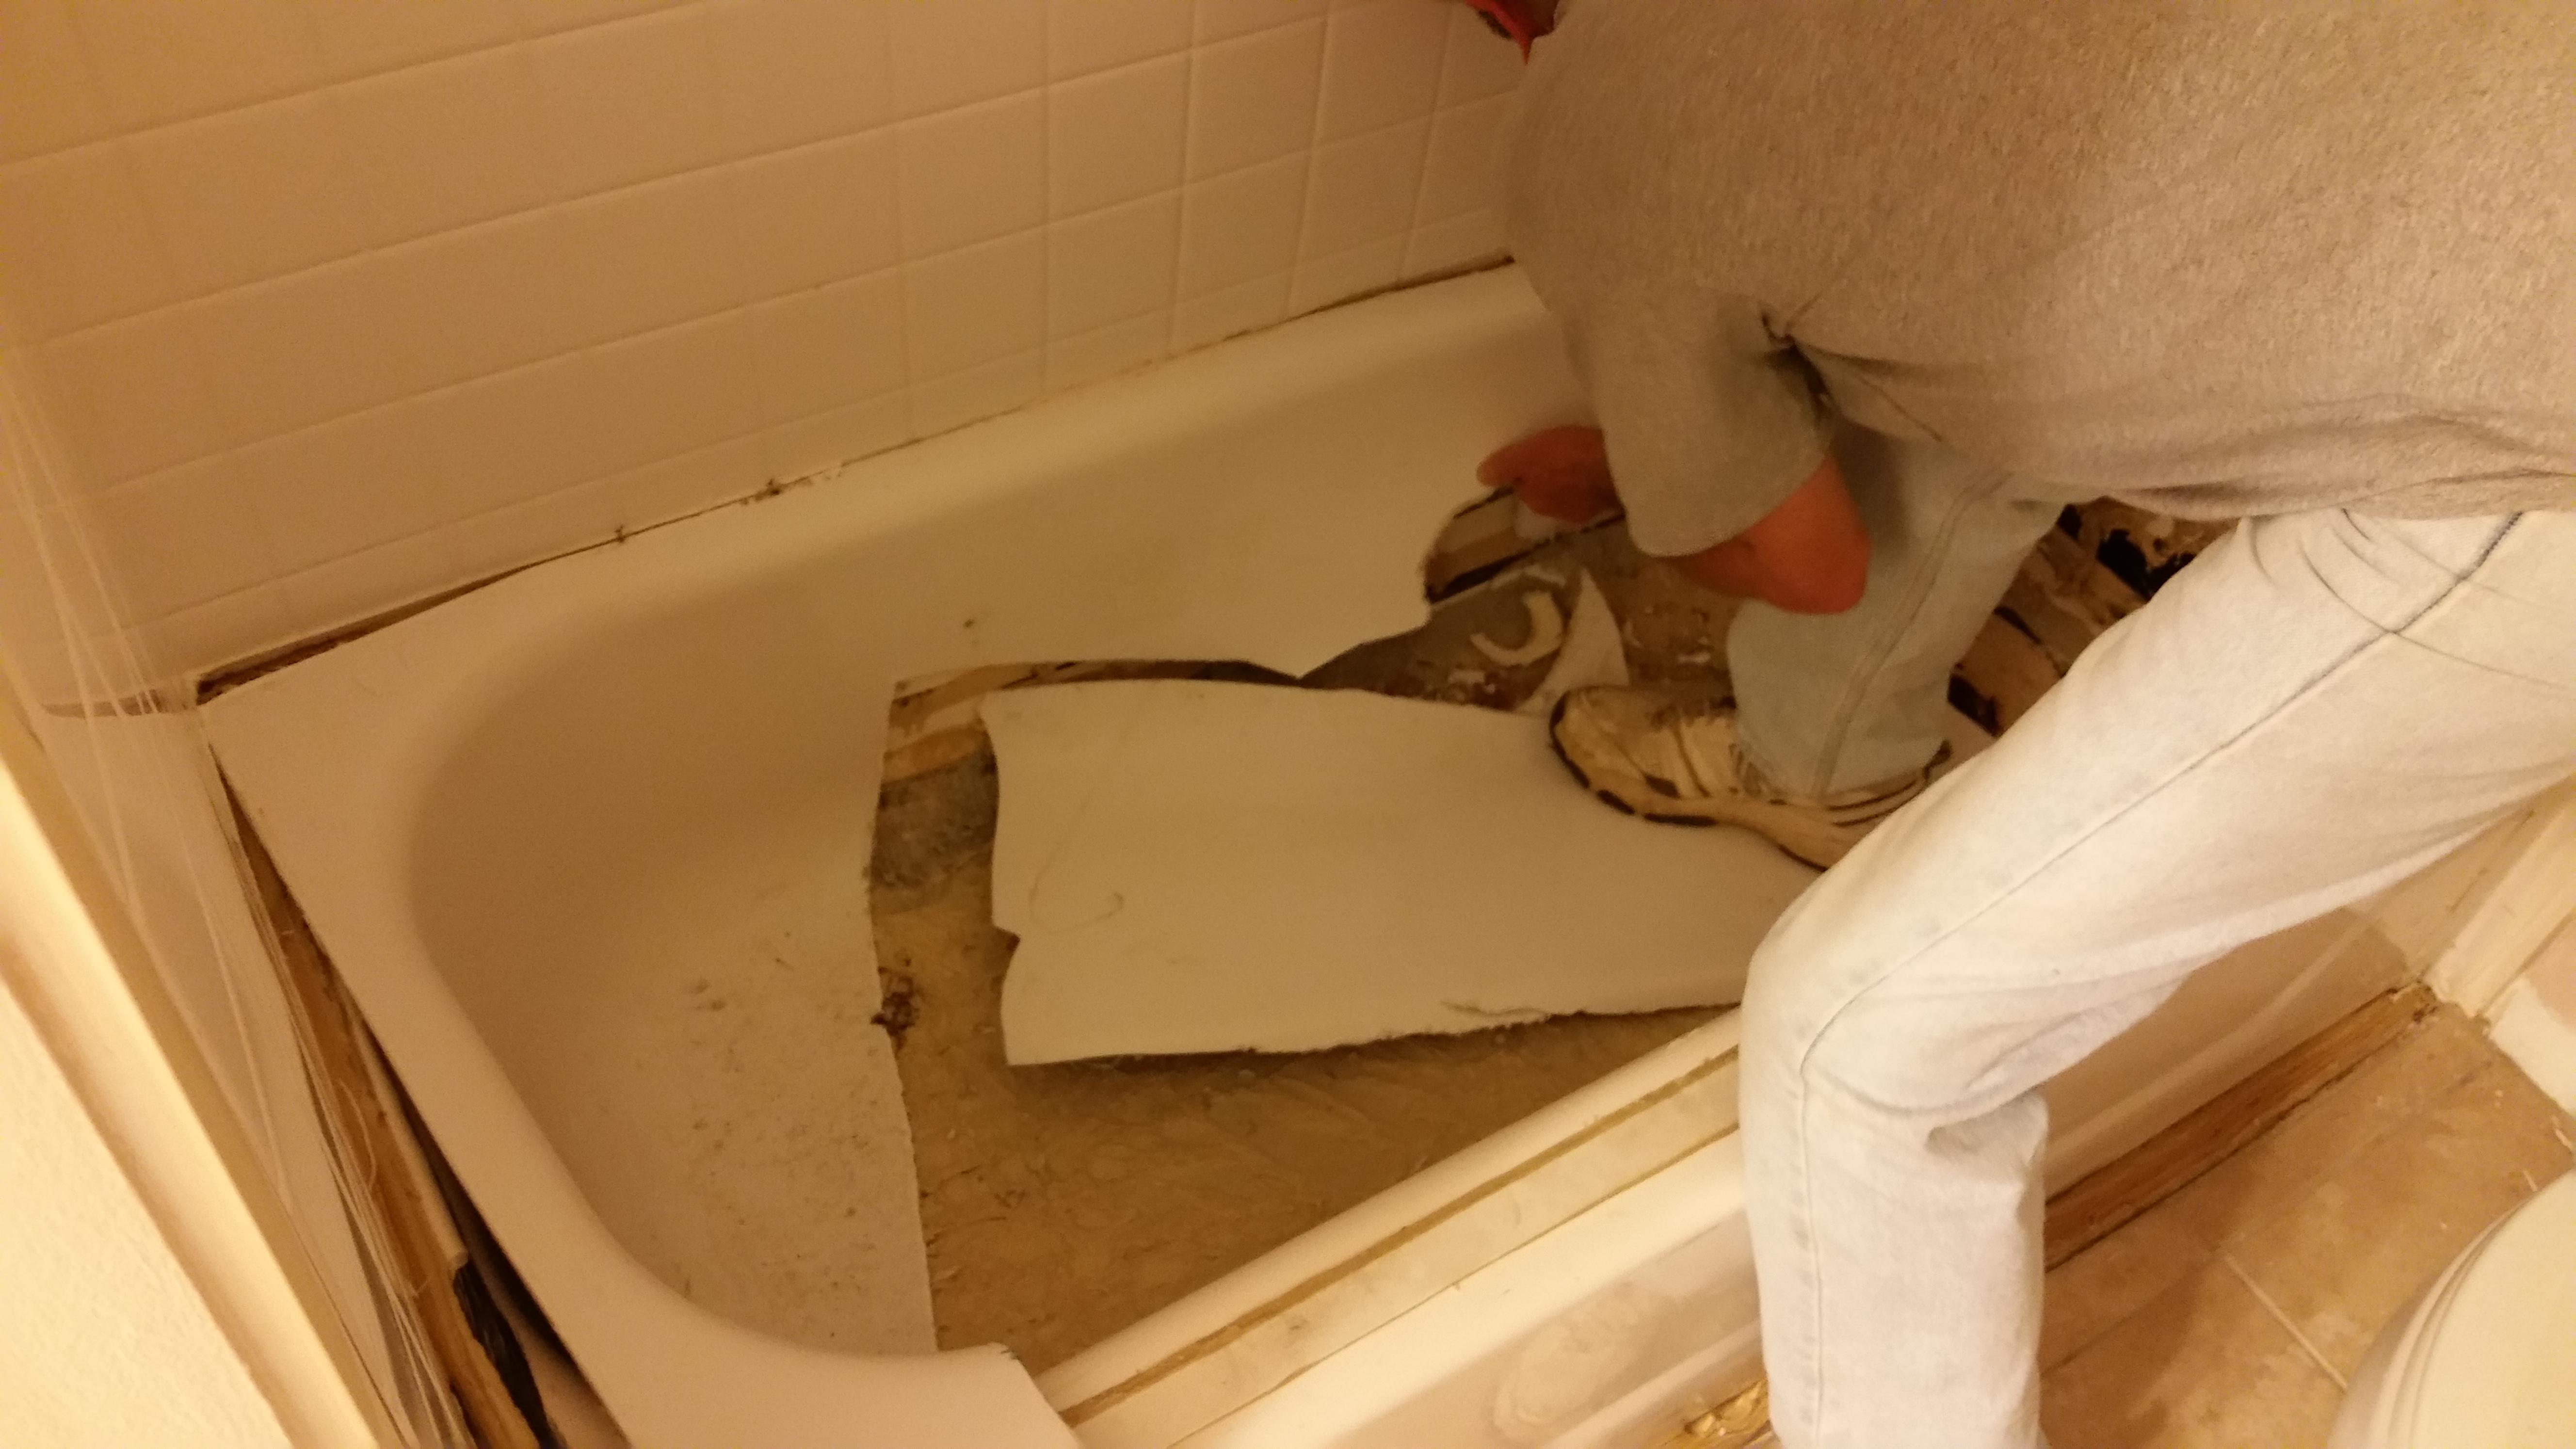 Chapel Hill Nc Porcelain Tub And Tile Bath Fitter Job